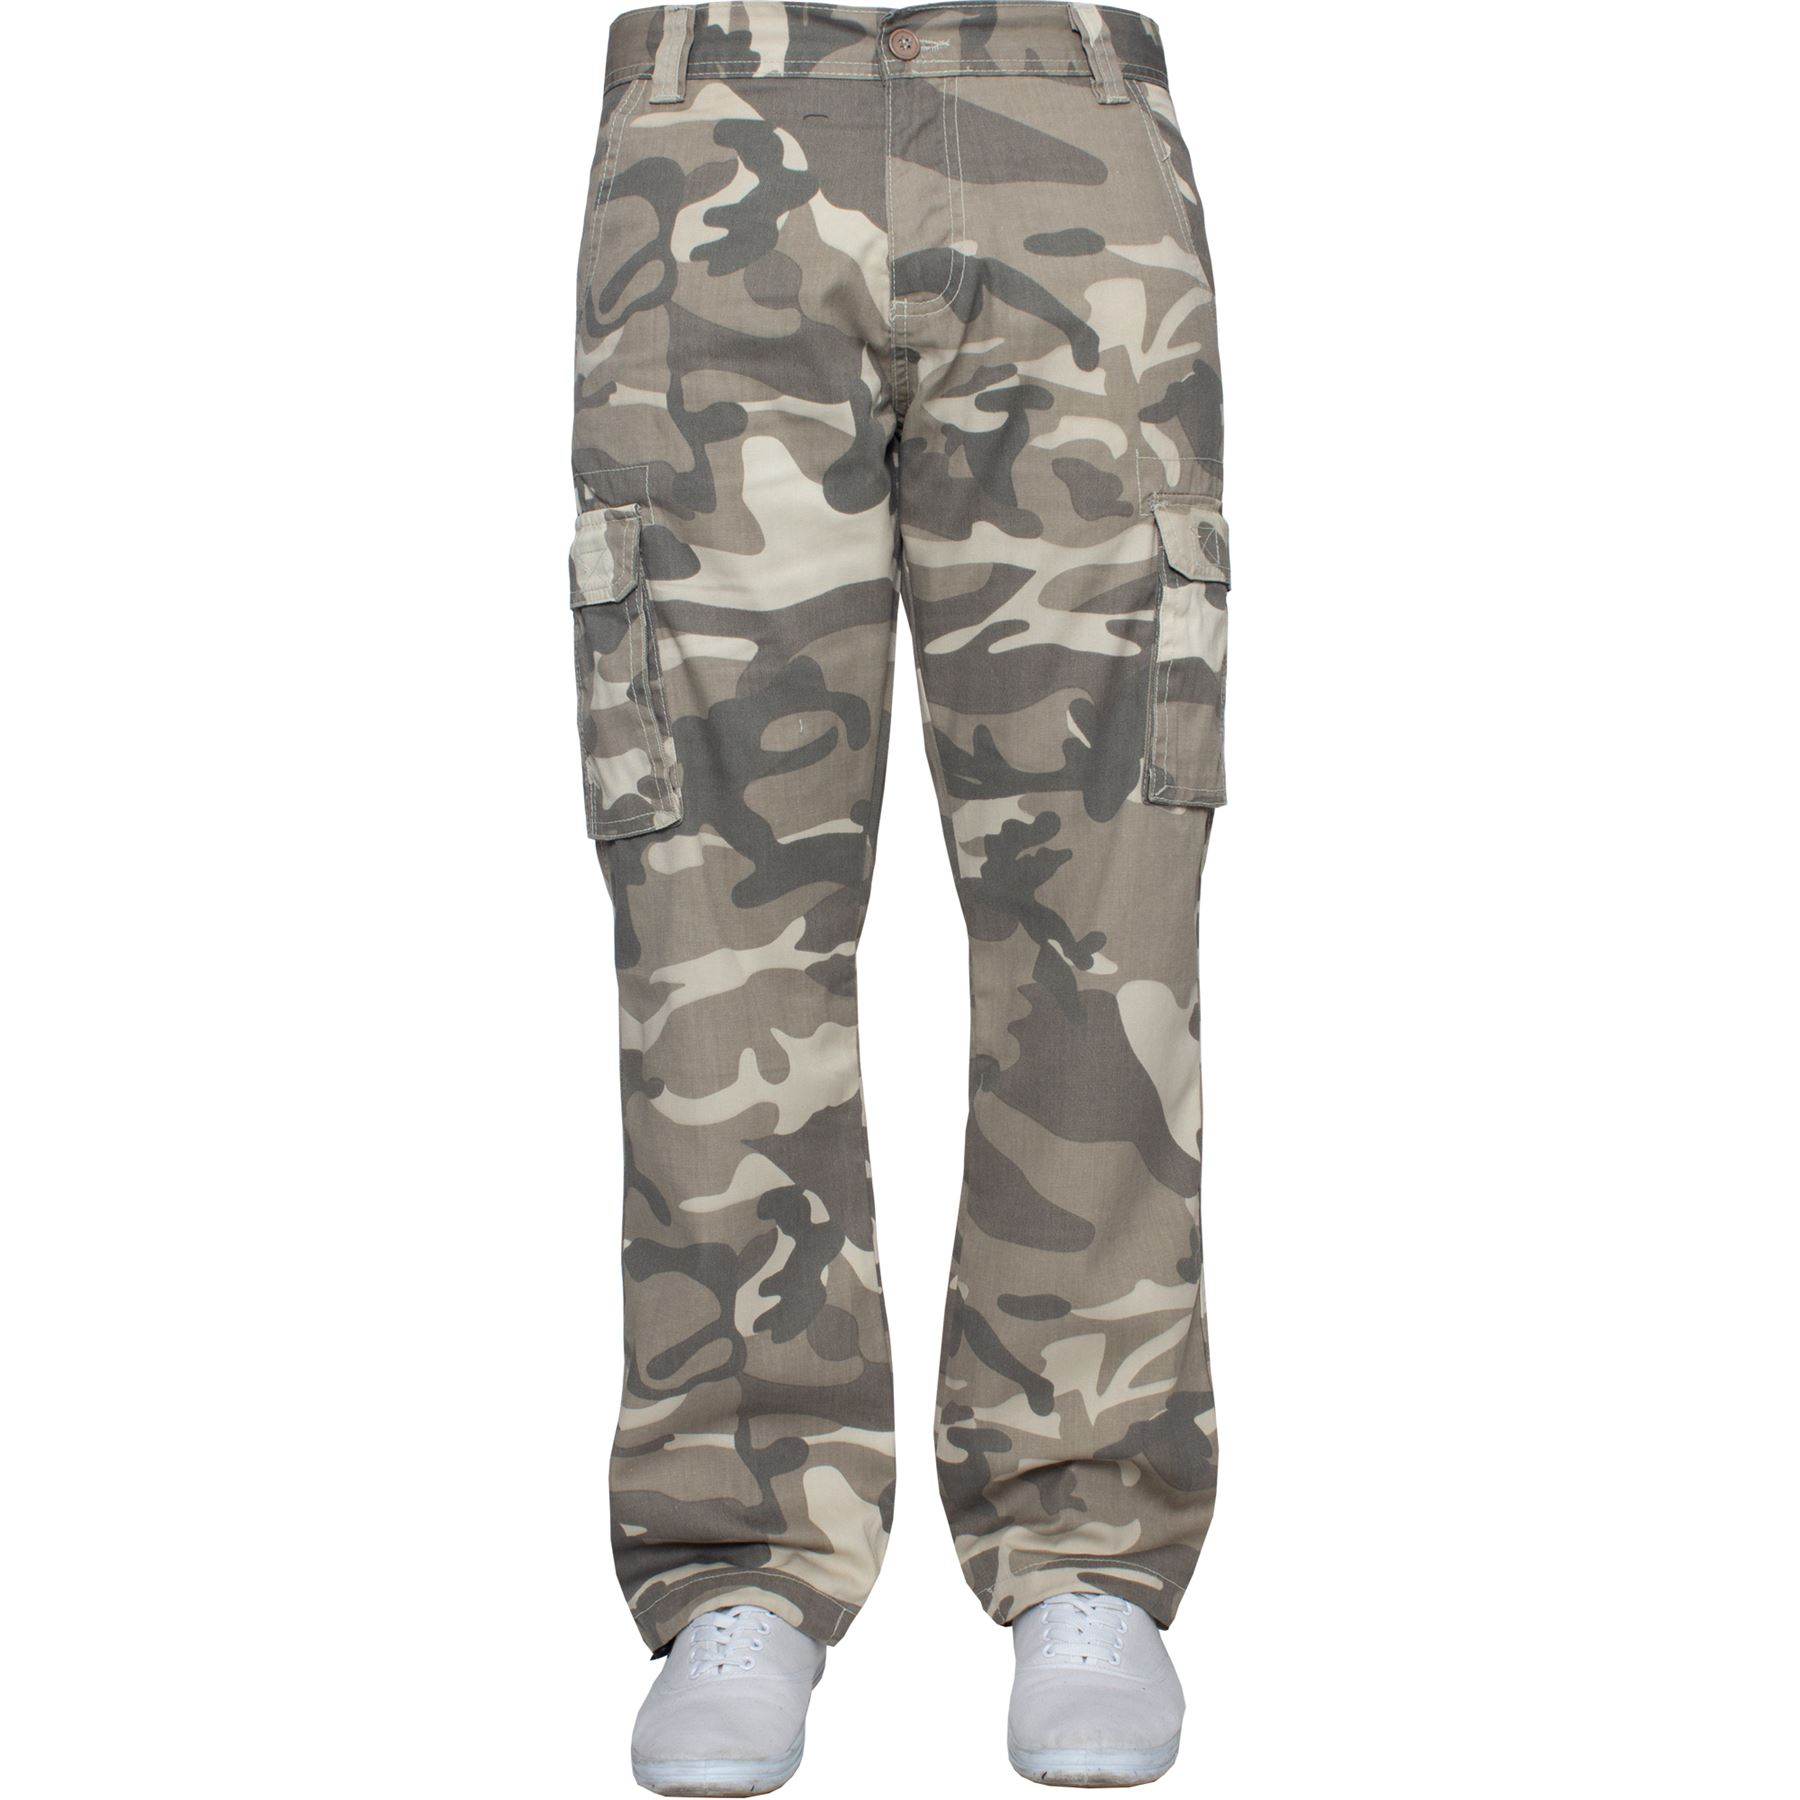 Mens Kruze Combat Cargo Trousers Khaki Camouflage Camo Summer Pants All Waist